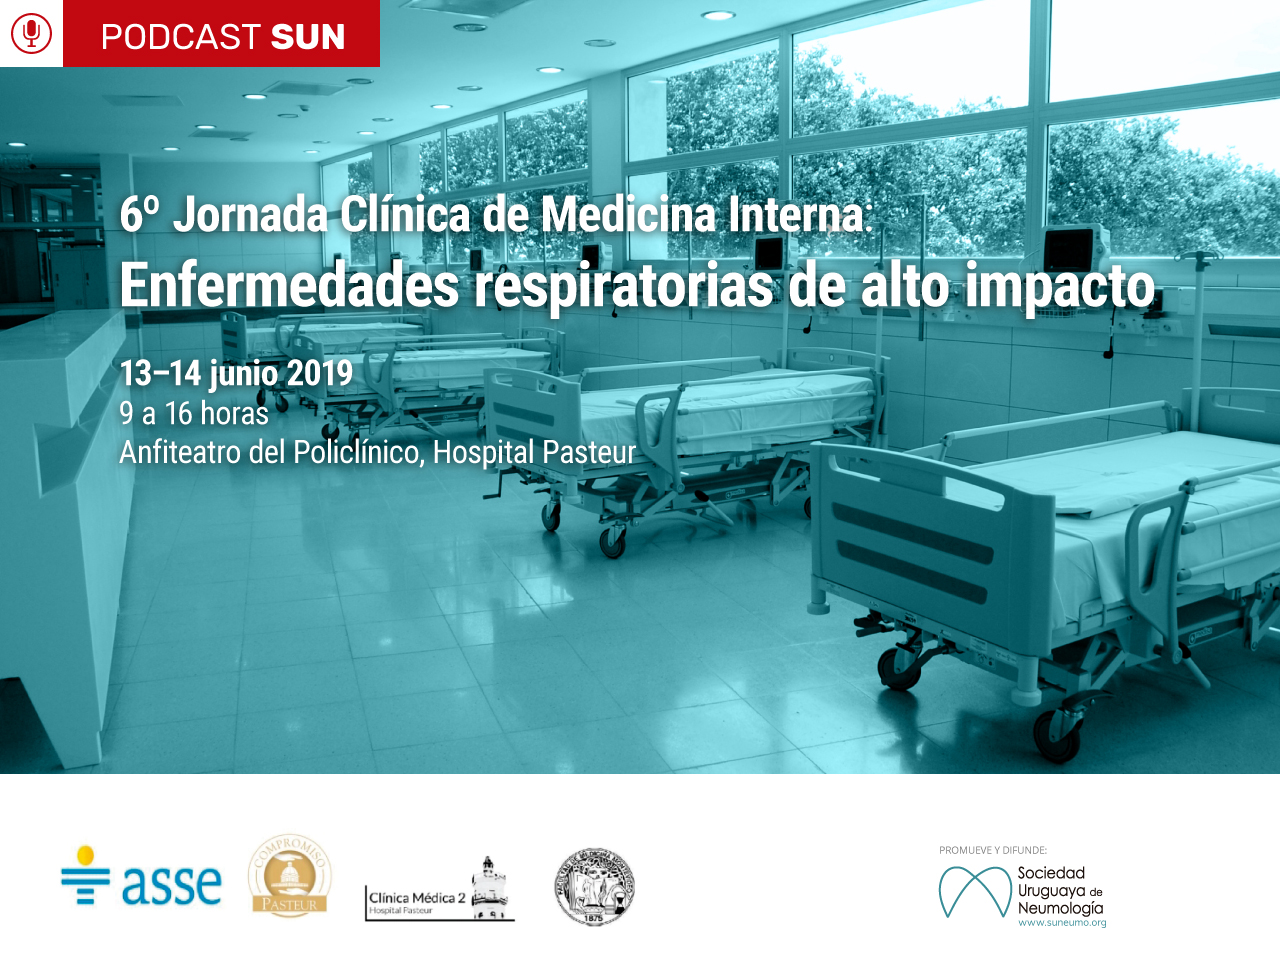 Podcast: 6ta Jornada Clínica de Medicina Interna. Enfermedades respiratorias de alto impacto